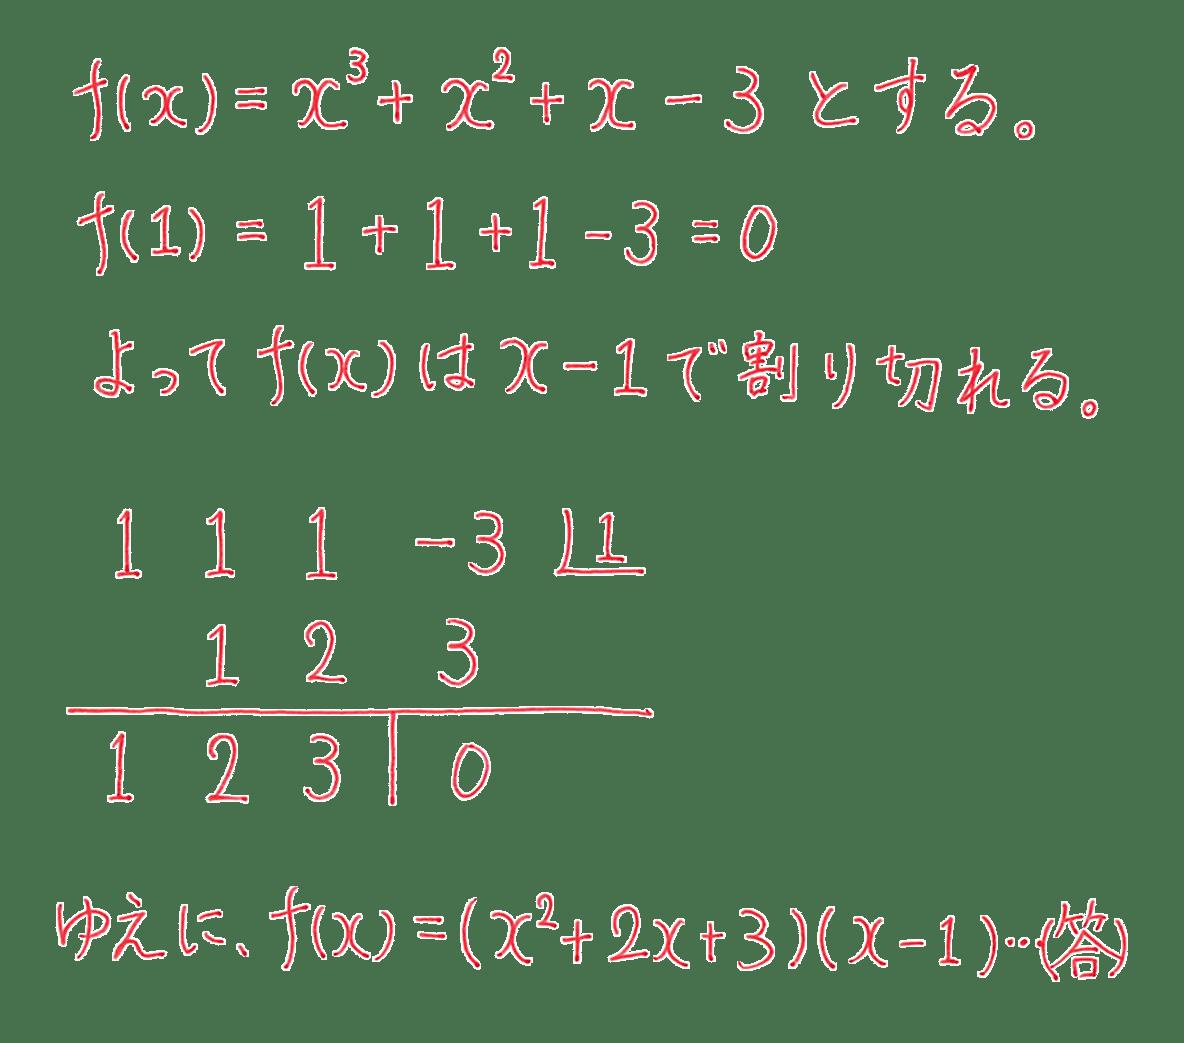 高校数学Ⅱ 式と証明15 例題 答え